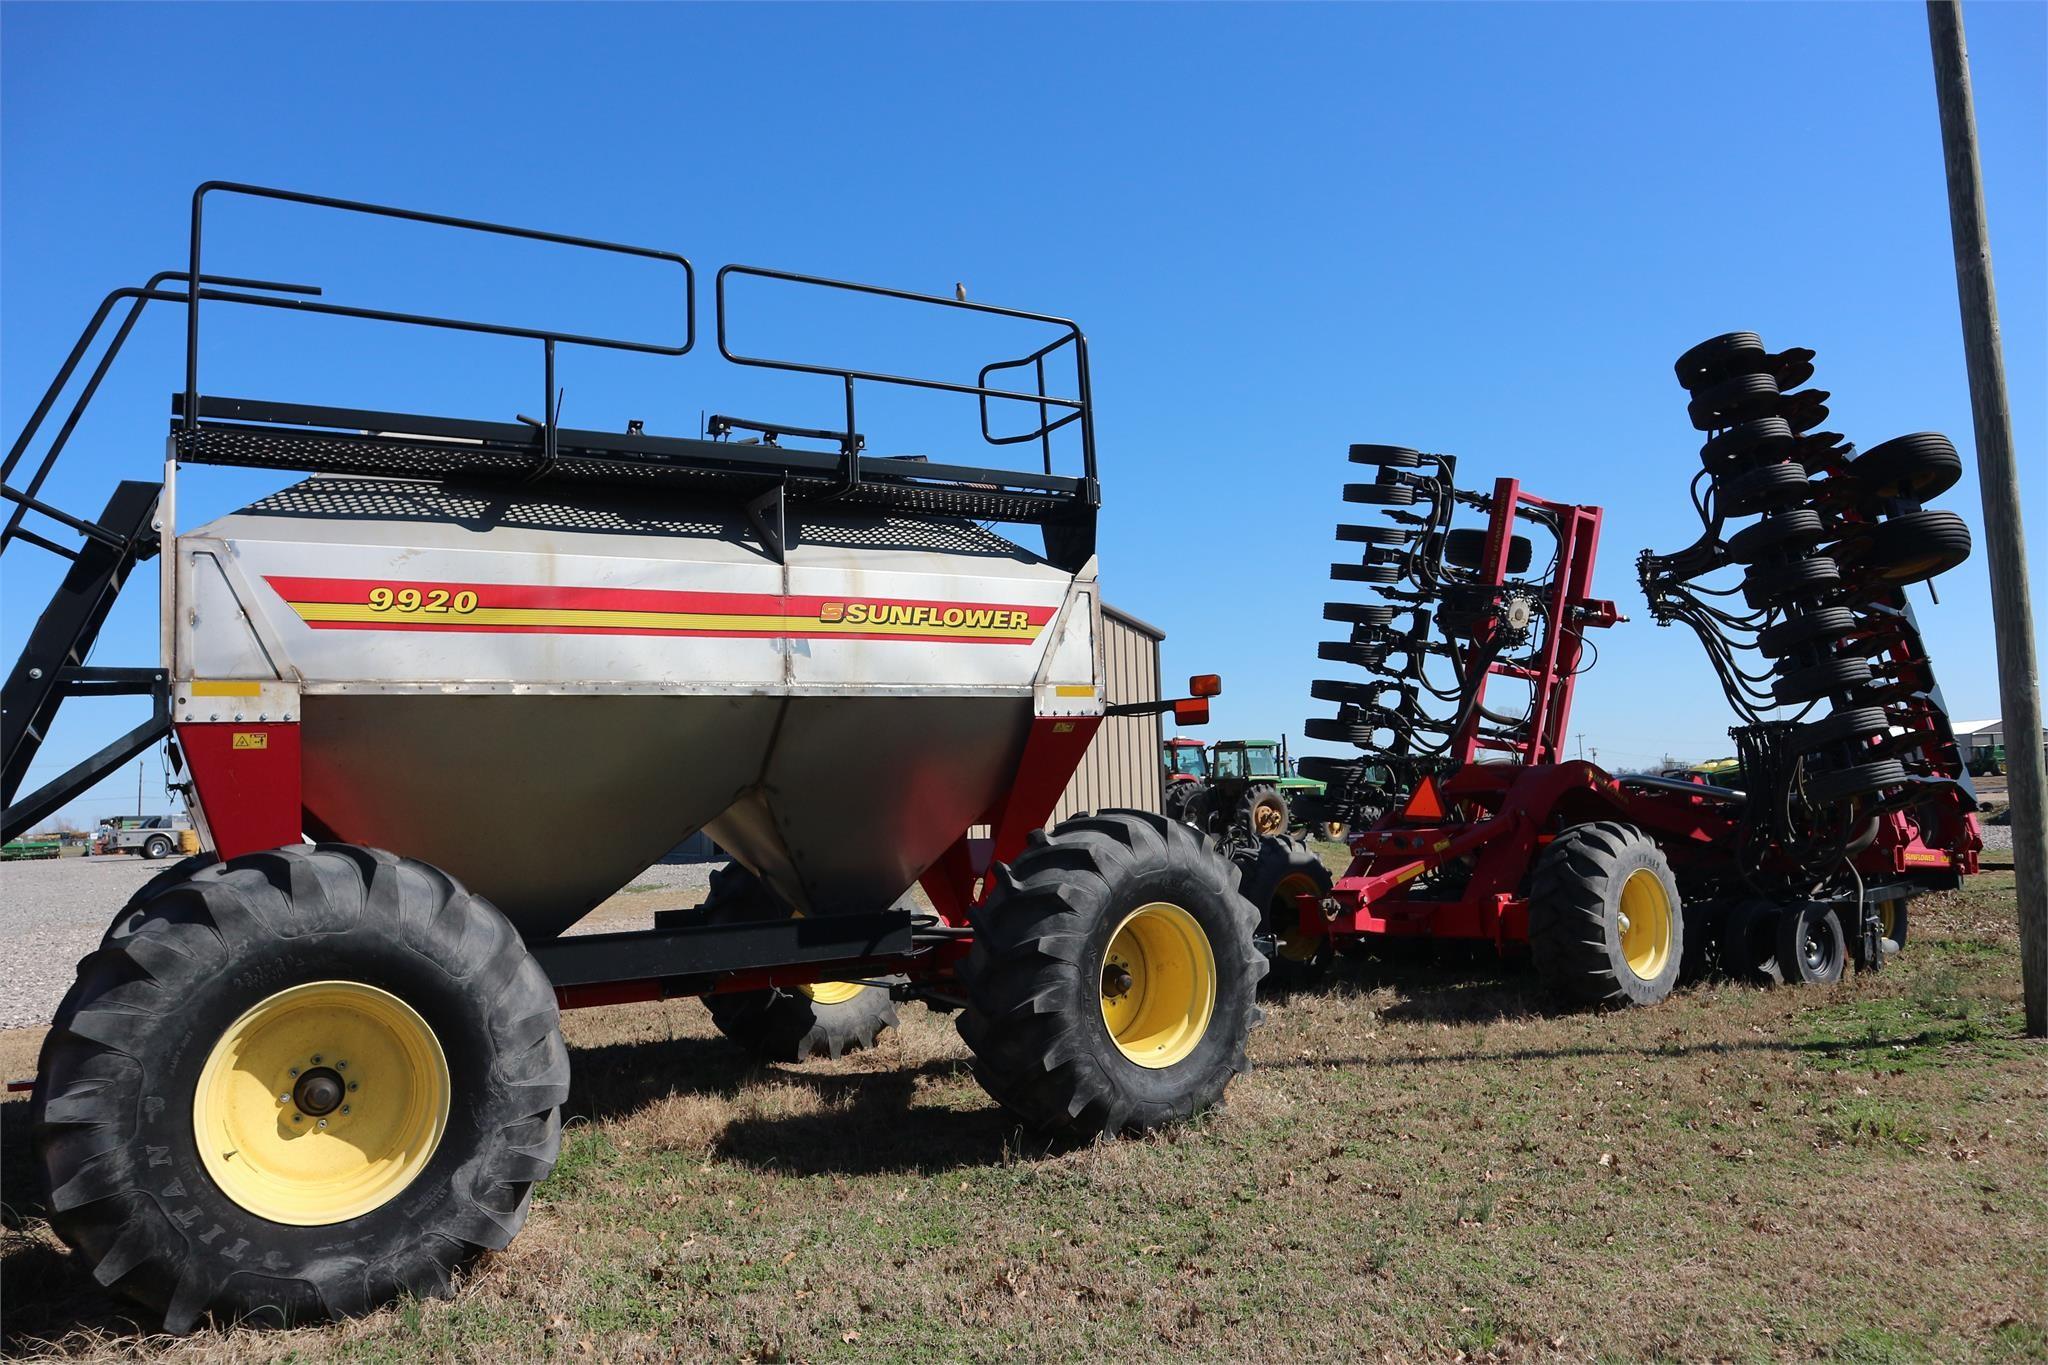 Sunflower 9830-40 Air Seeder